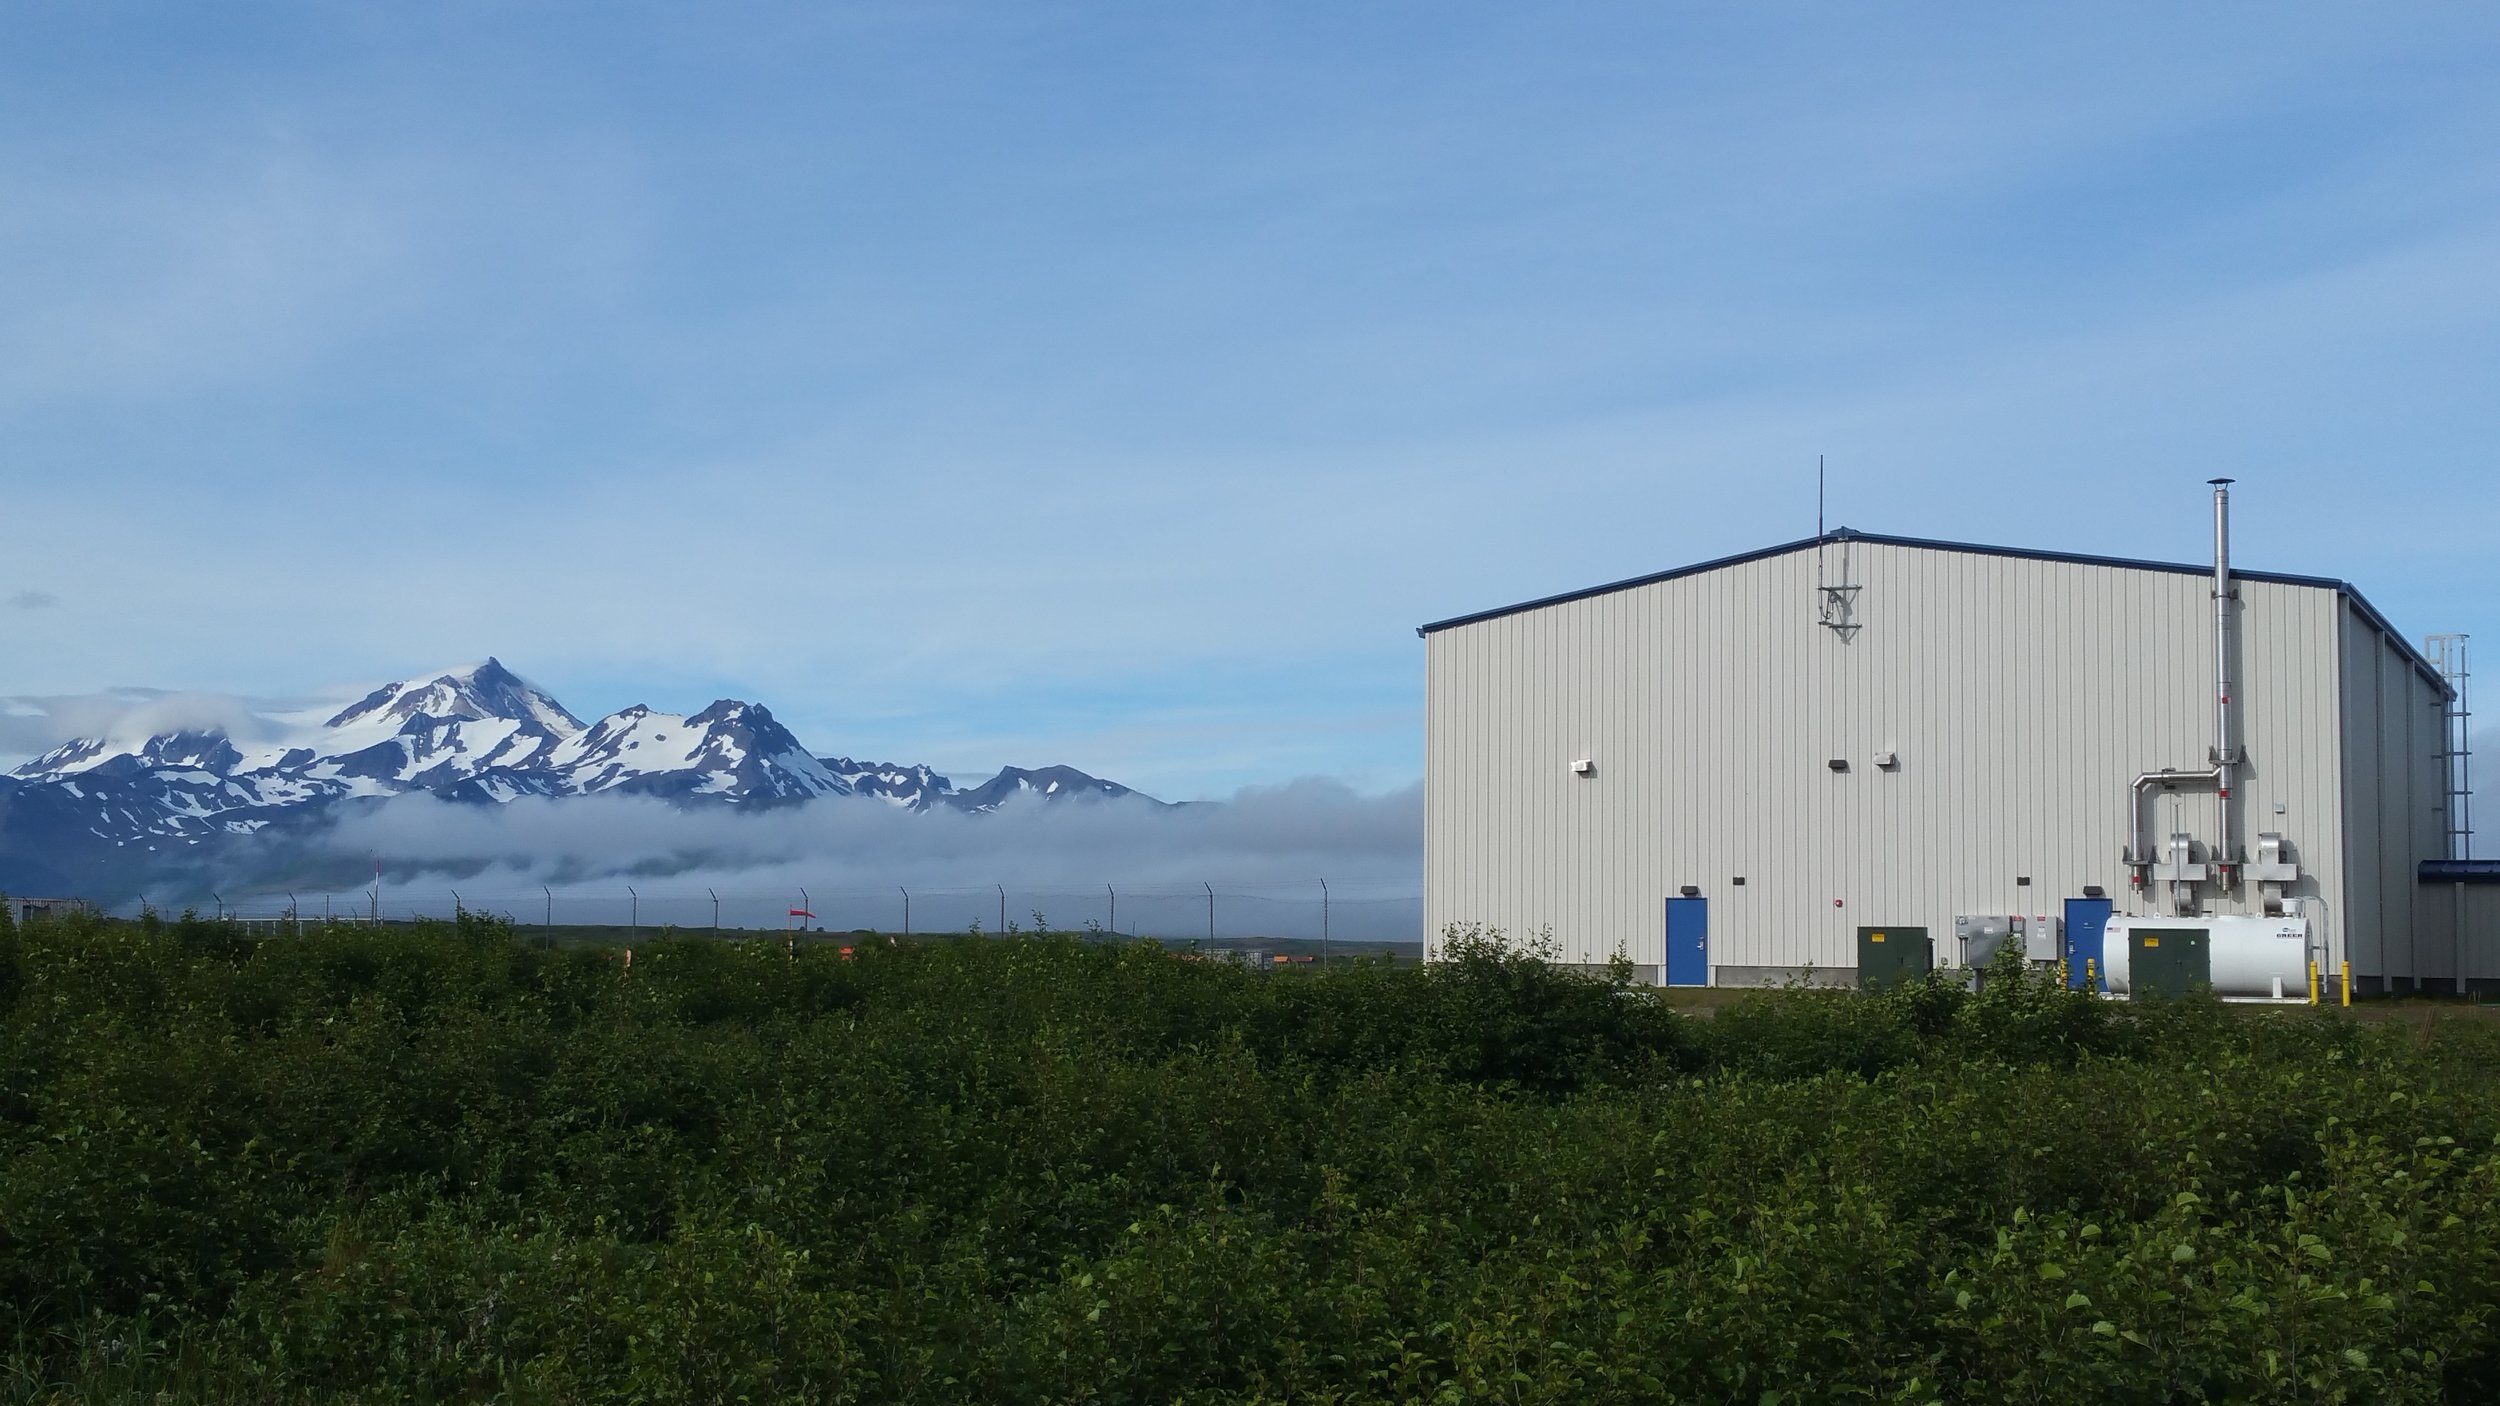 New Hangar Exterior